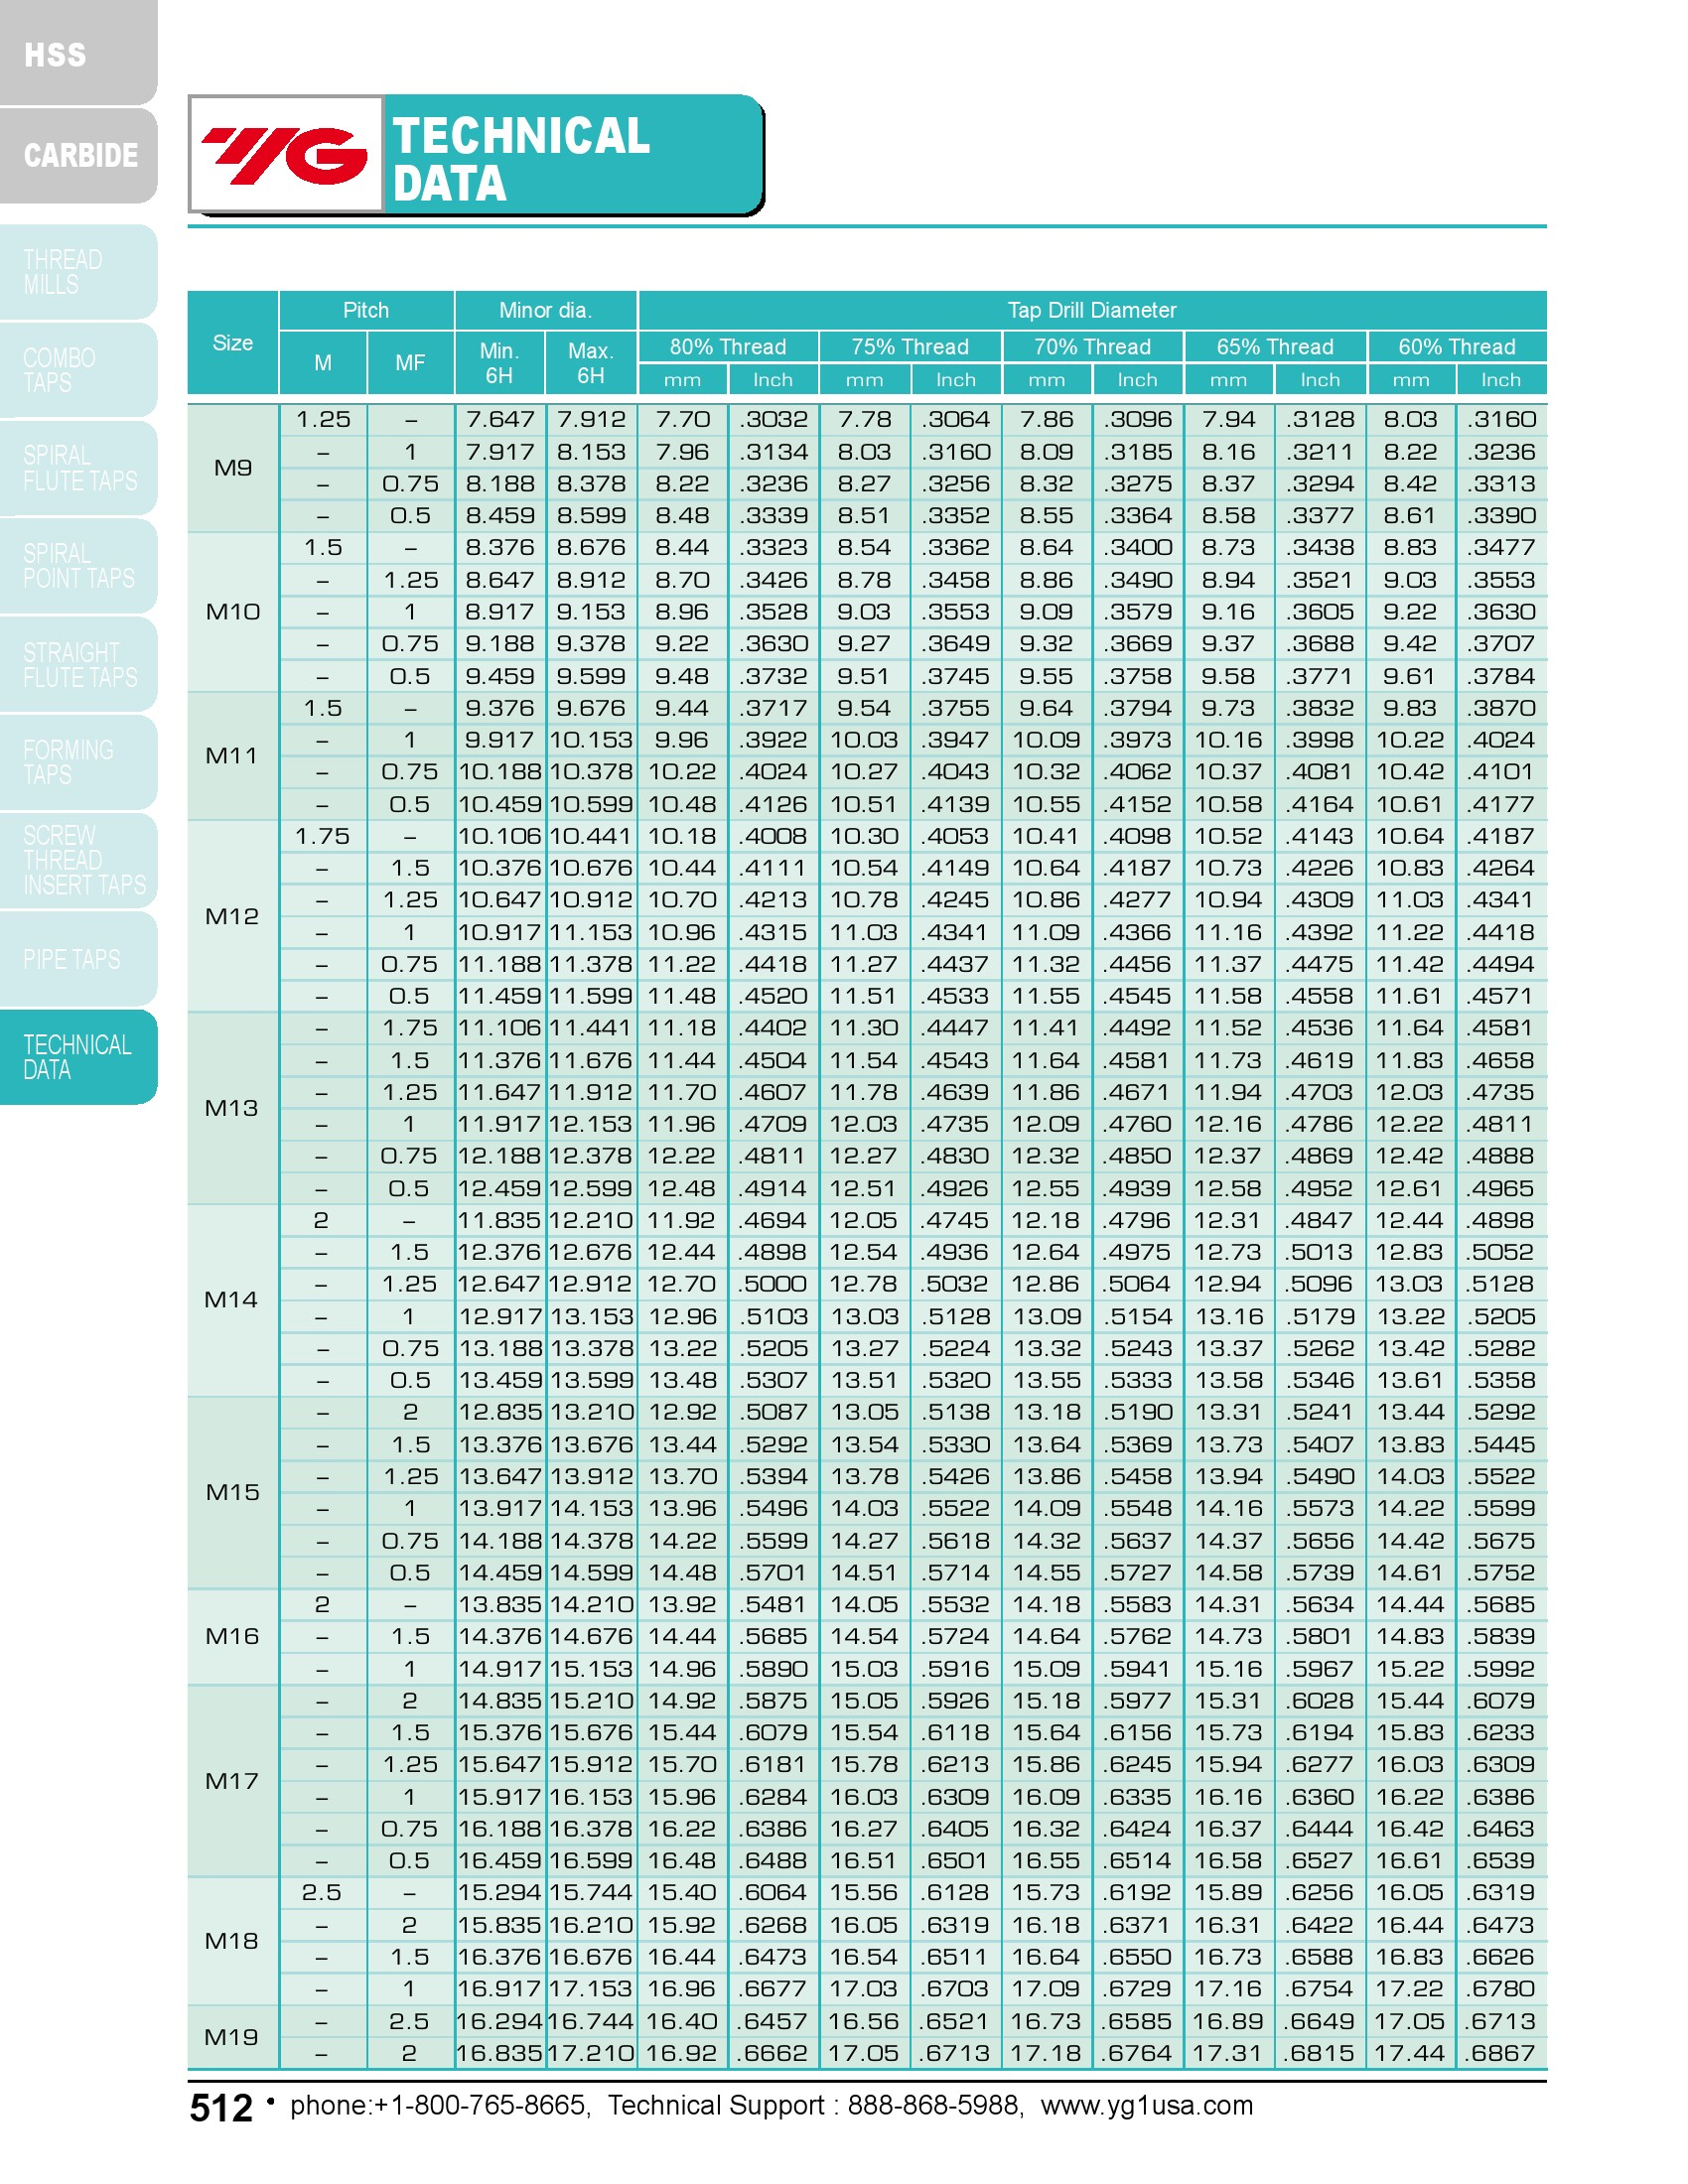 3pcs 5//16-24 H4 3 Spiral Flutes Bottom HSS-EX TiCN CNC DIN Length Combo-Tap